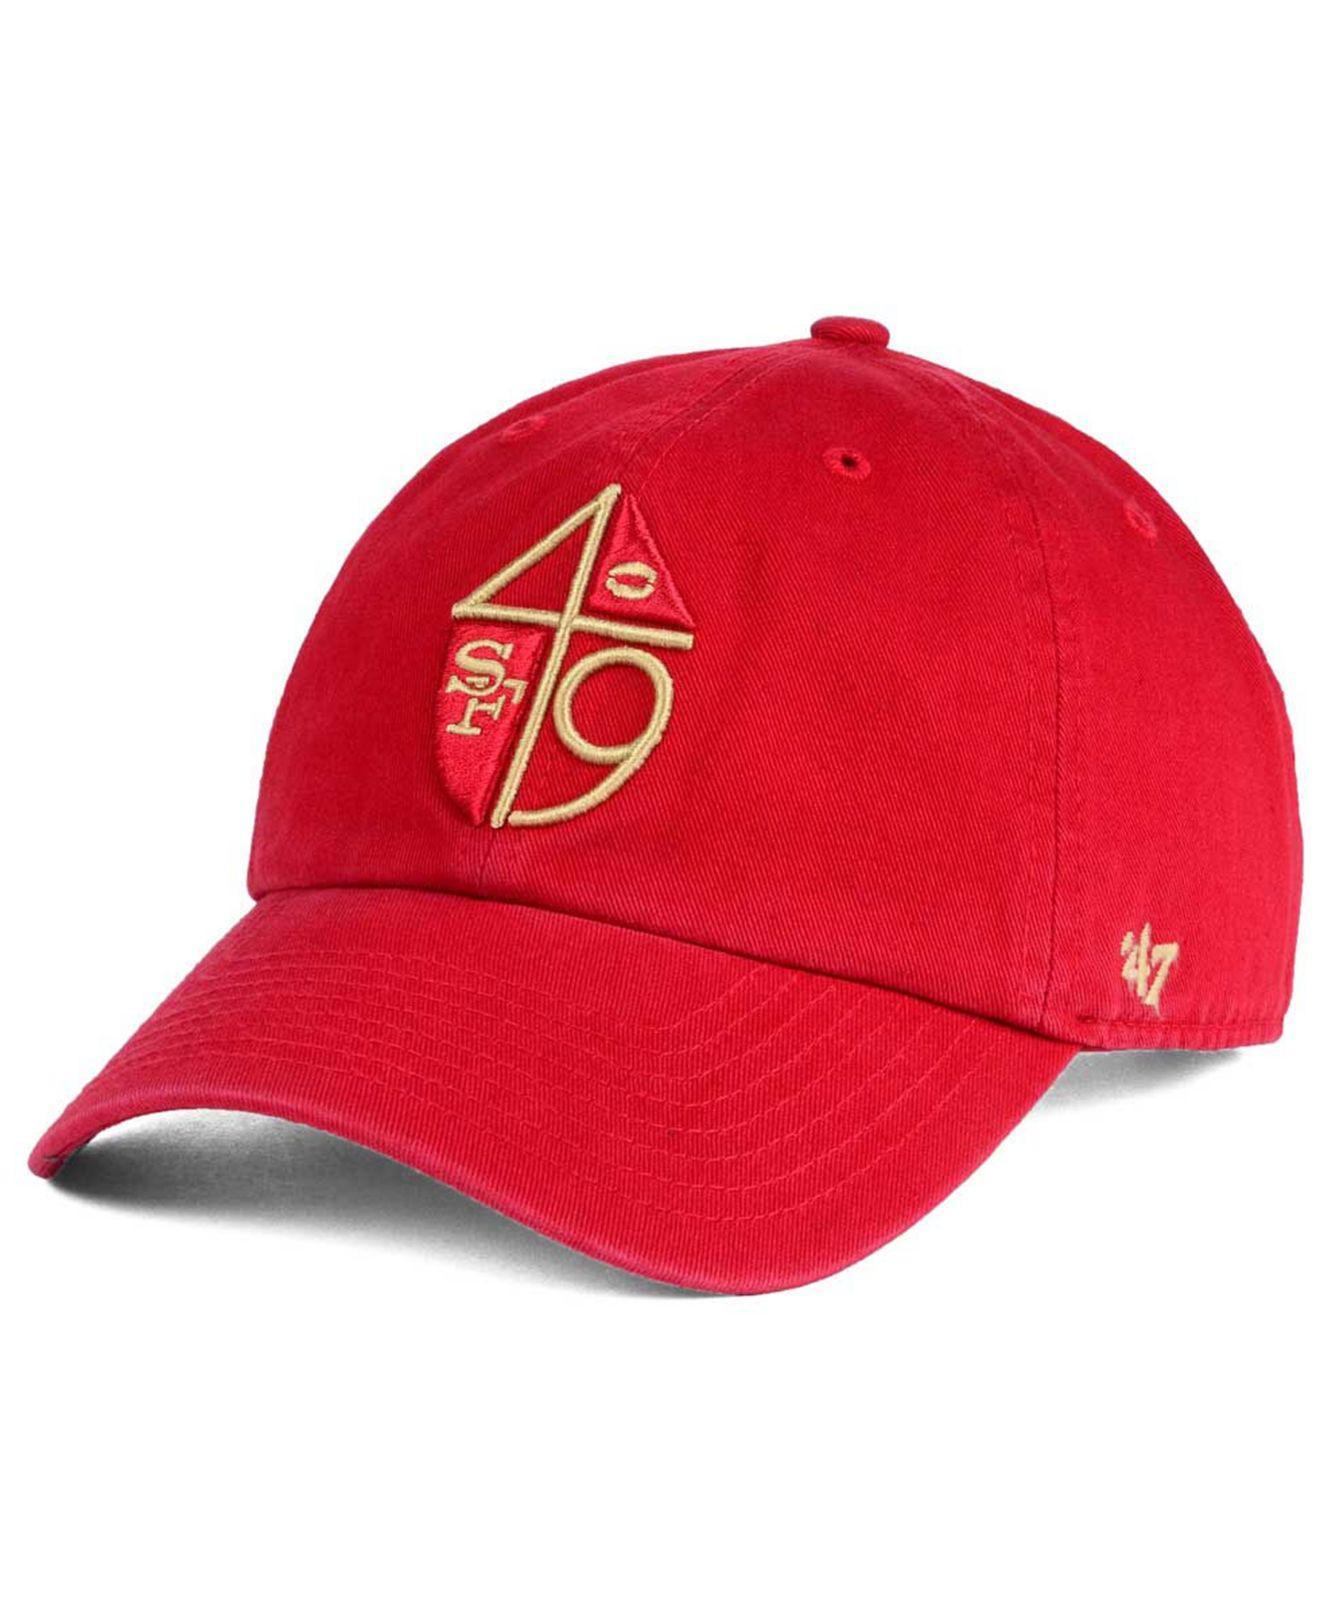 ae8a8711b4edb5 Lyst - 47 Brand San Francisco 49ers Clean Up Strapback Cap in Red ...